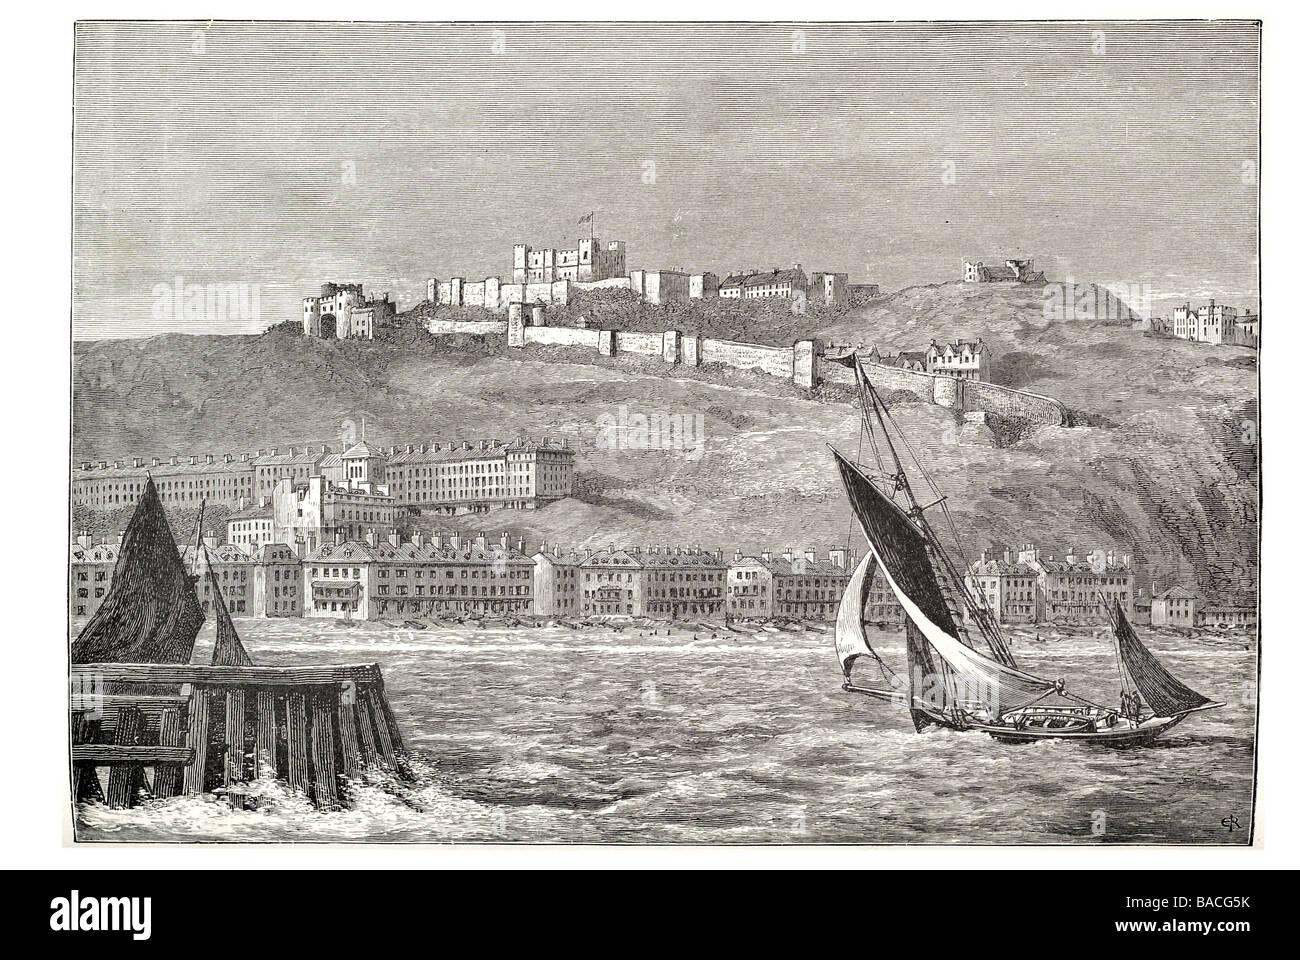 dover castle from the sea Kent gun platform heavy artillery medieval Stock Photo